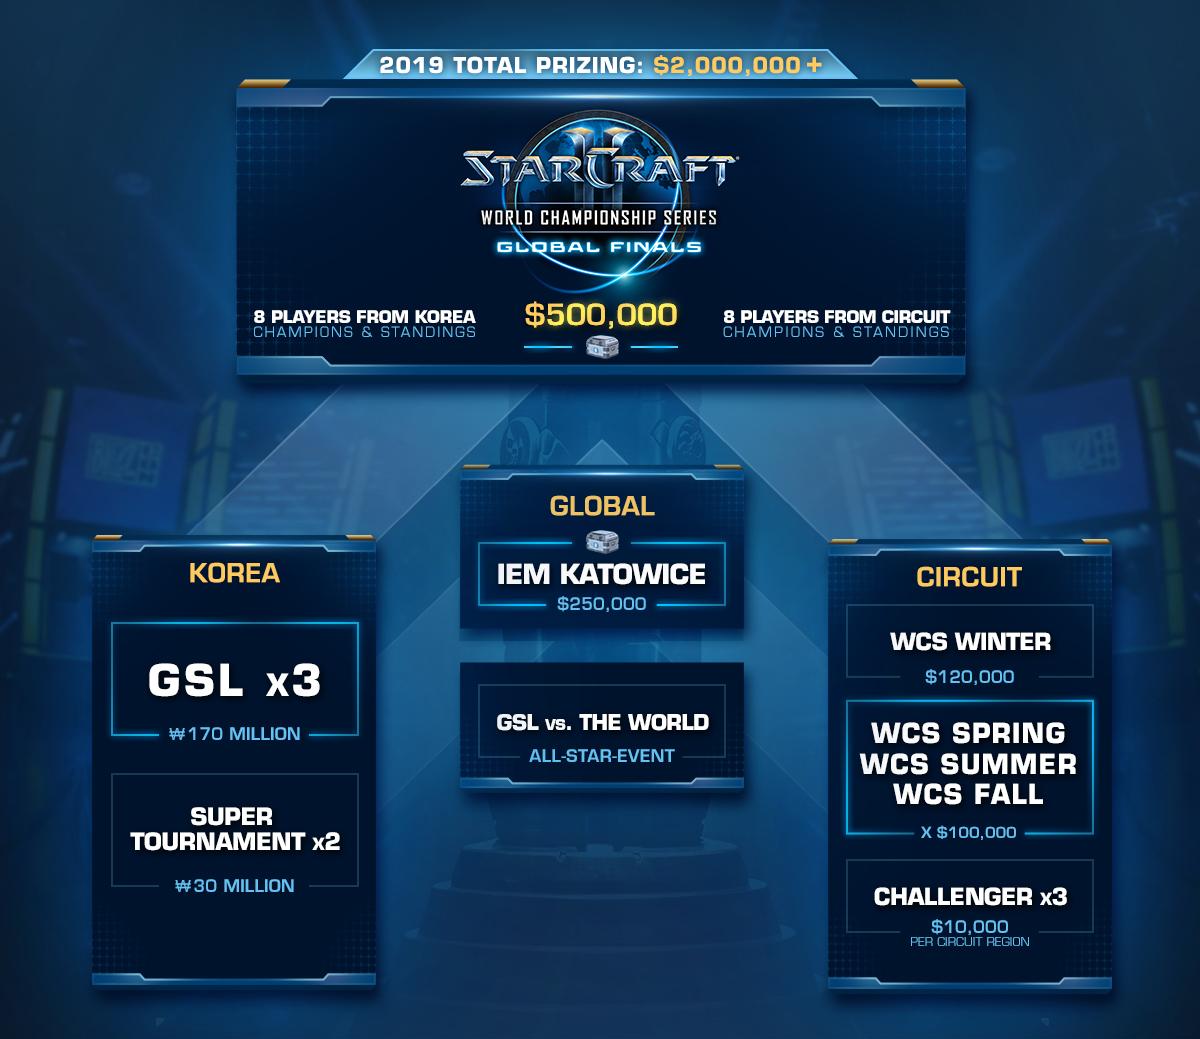 StarCraft II World Championship Series 2019